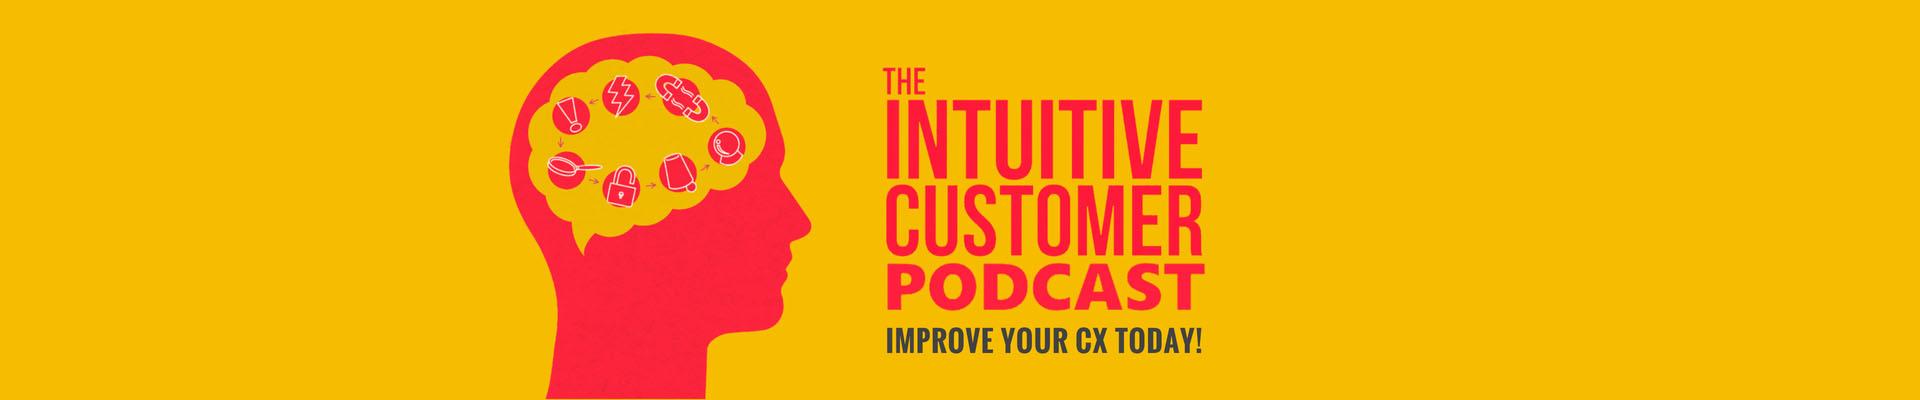 instuitive customer podcast